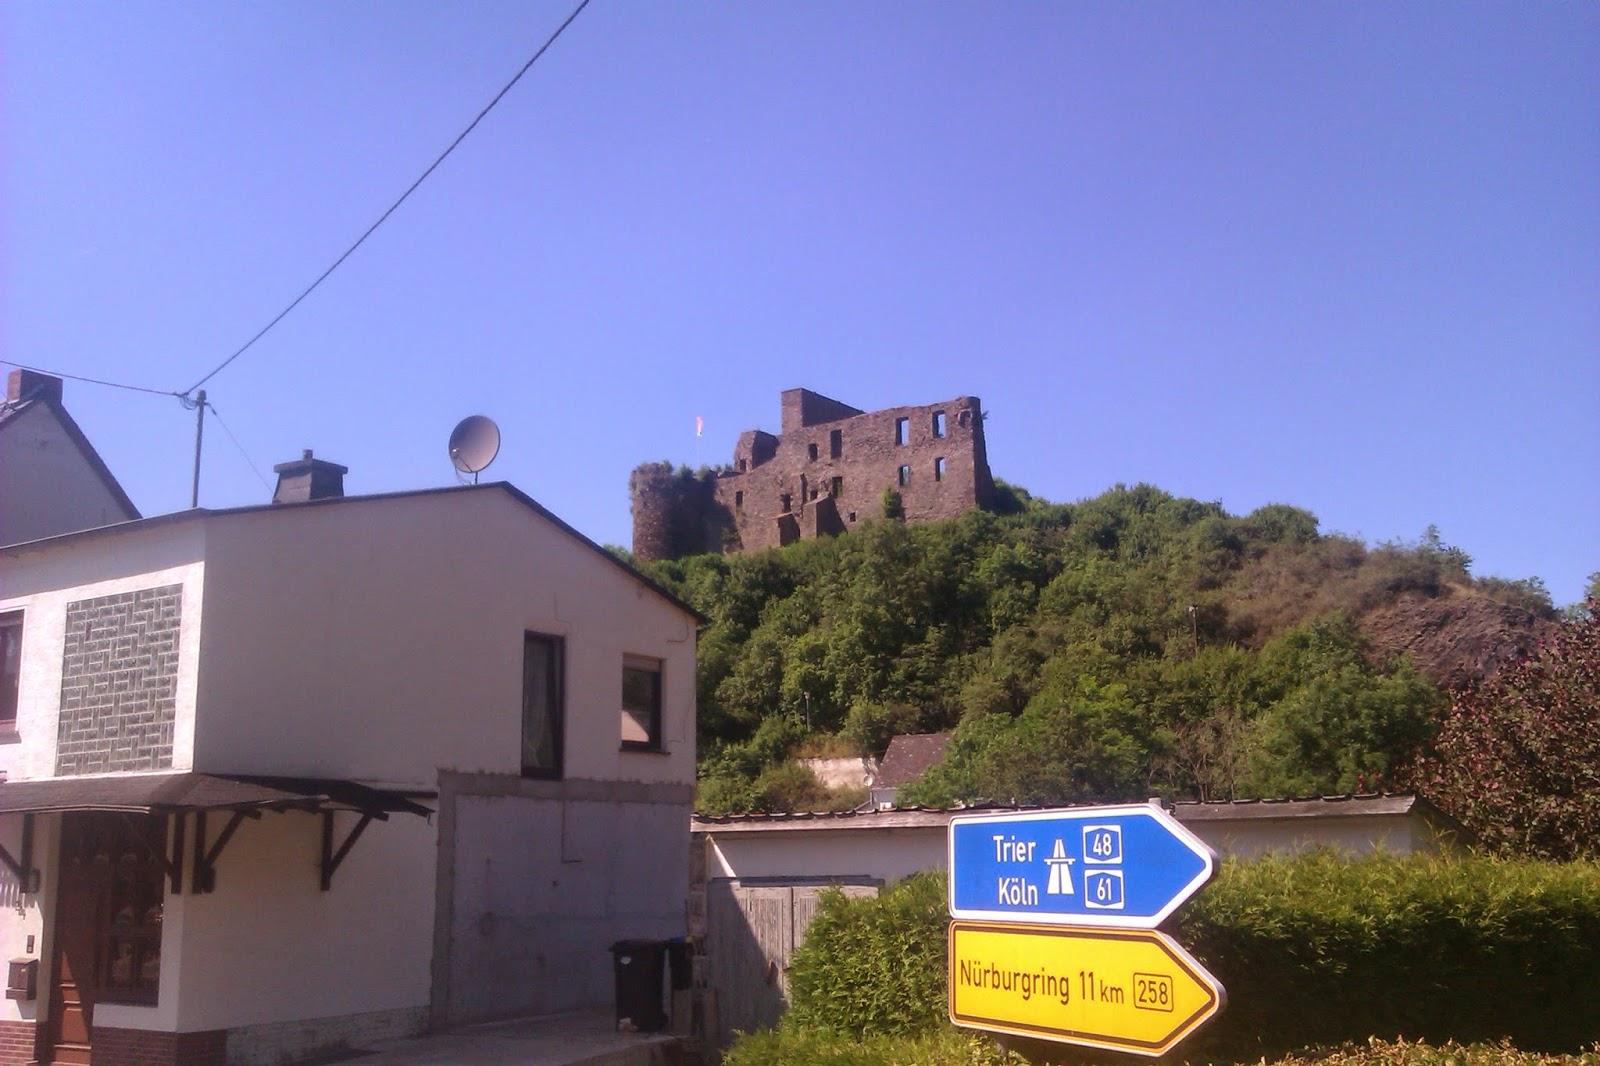 Virne Burg